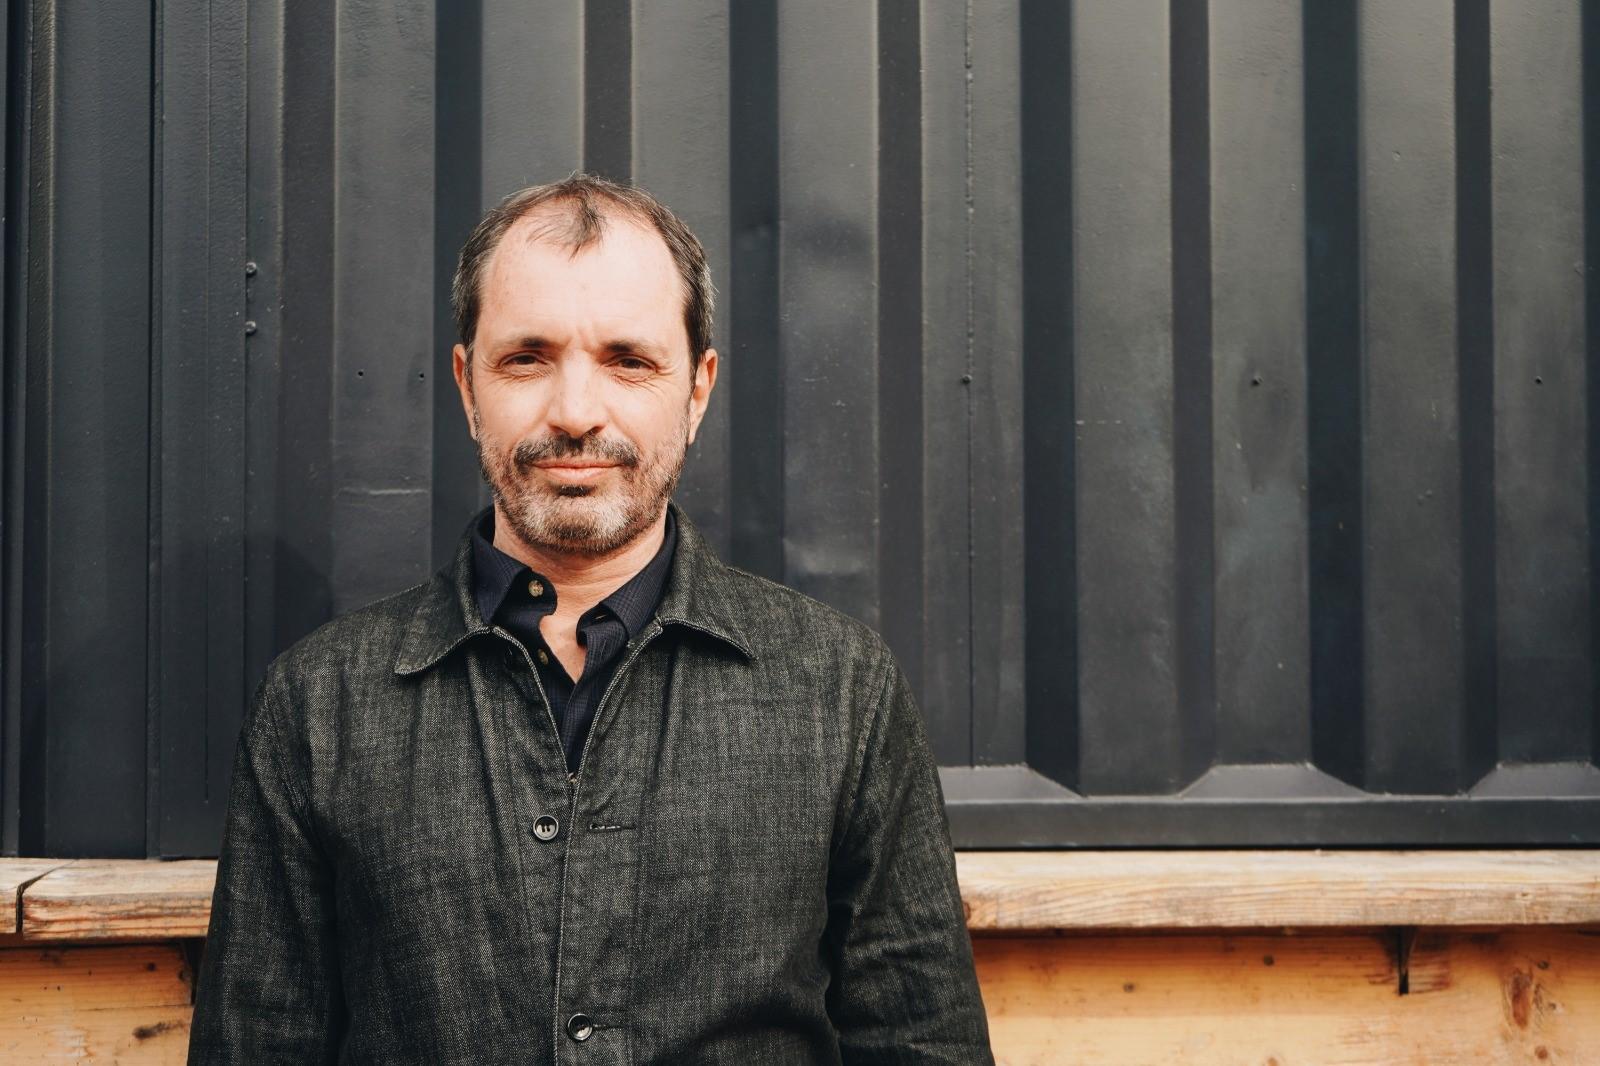 Arnaud Frisch, founder & owner of Silencio